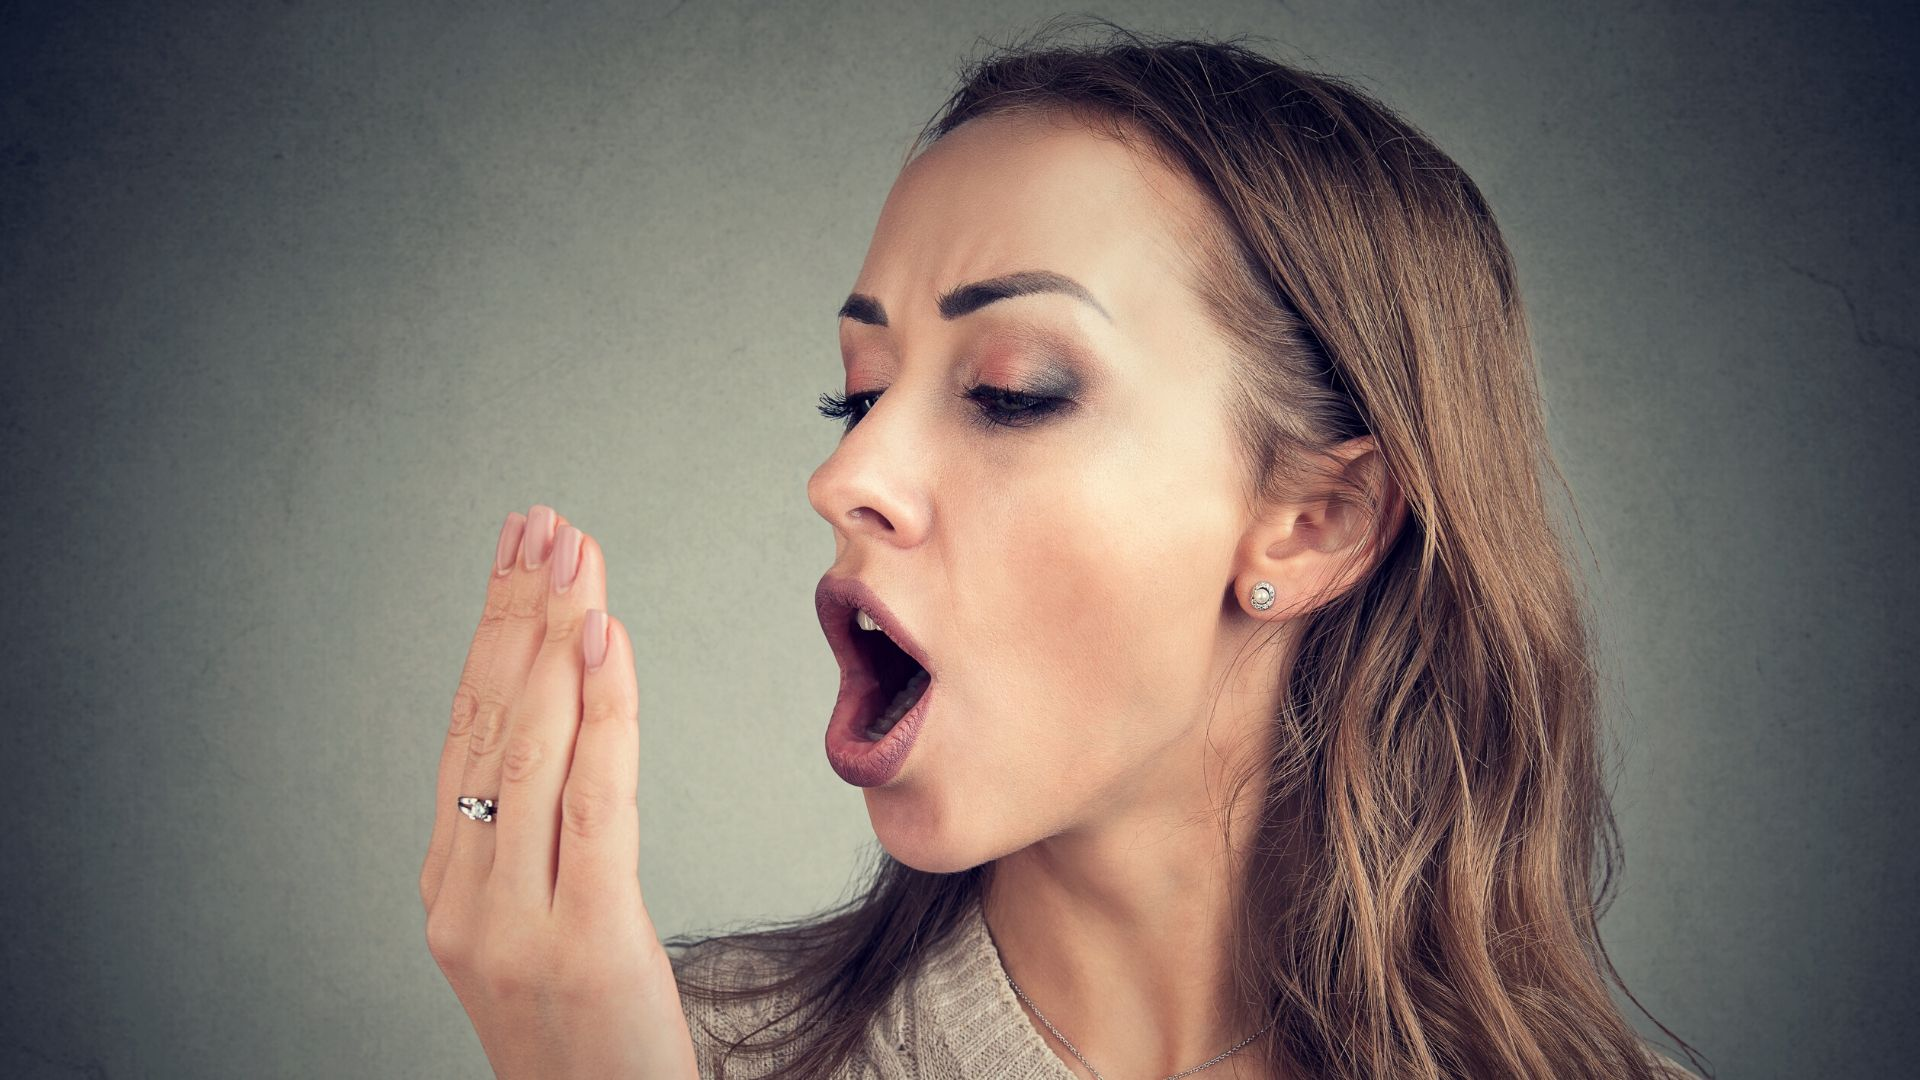 Traiter la mauvaise haleine